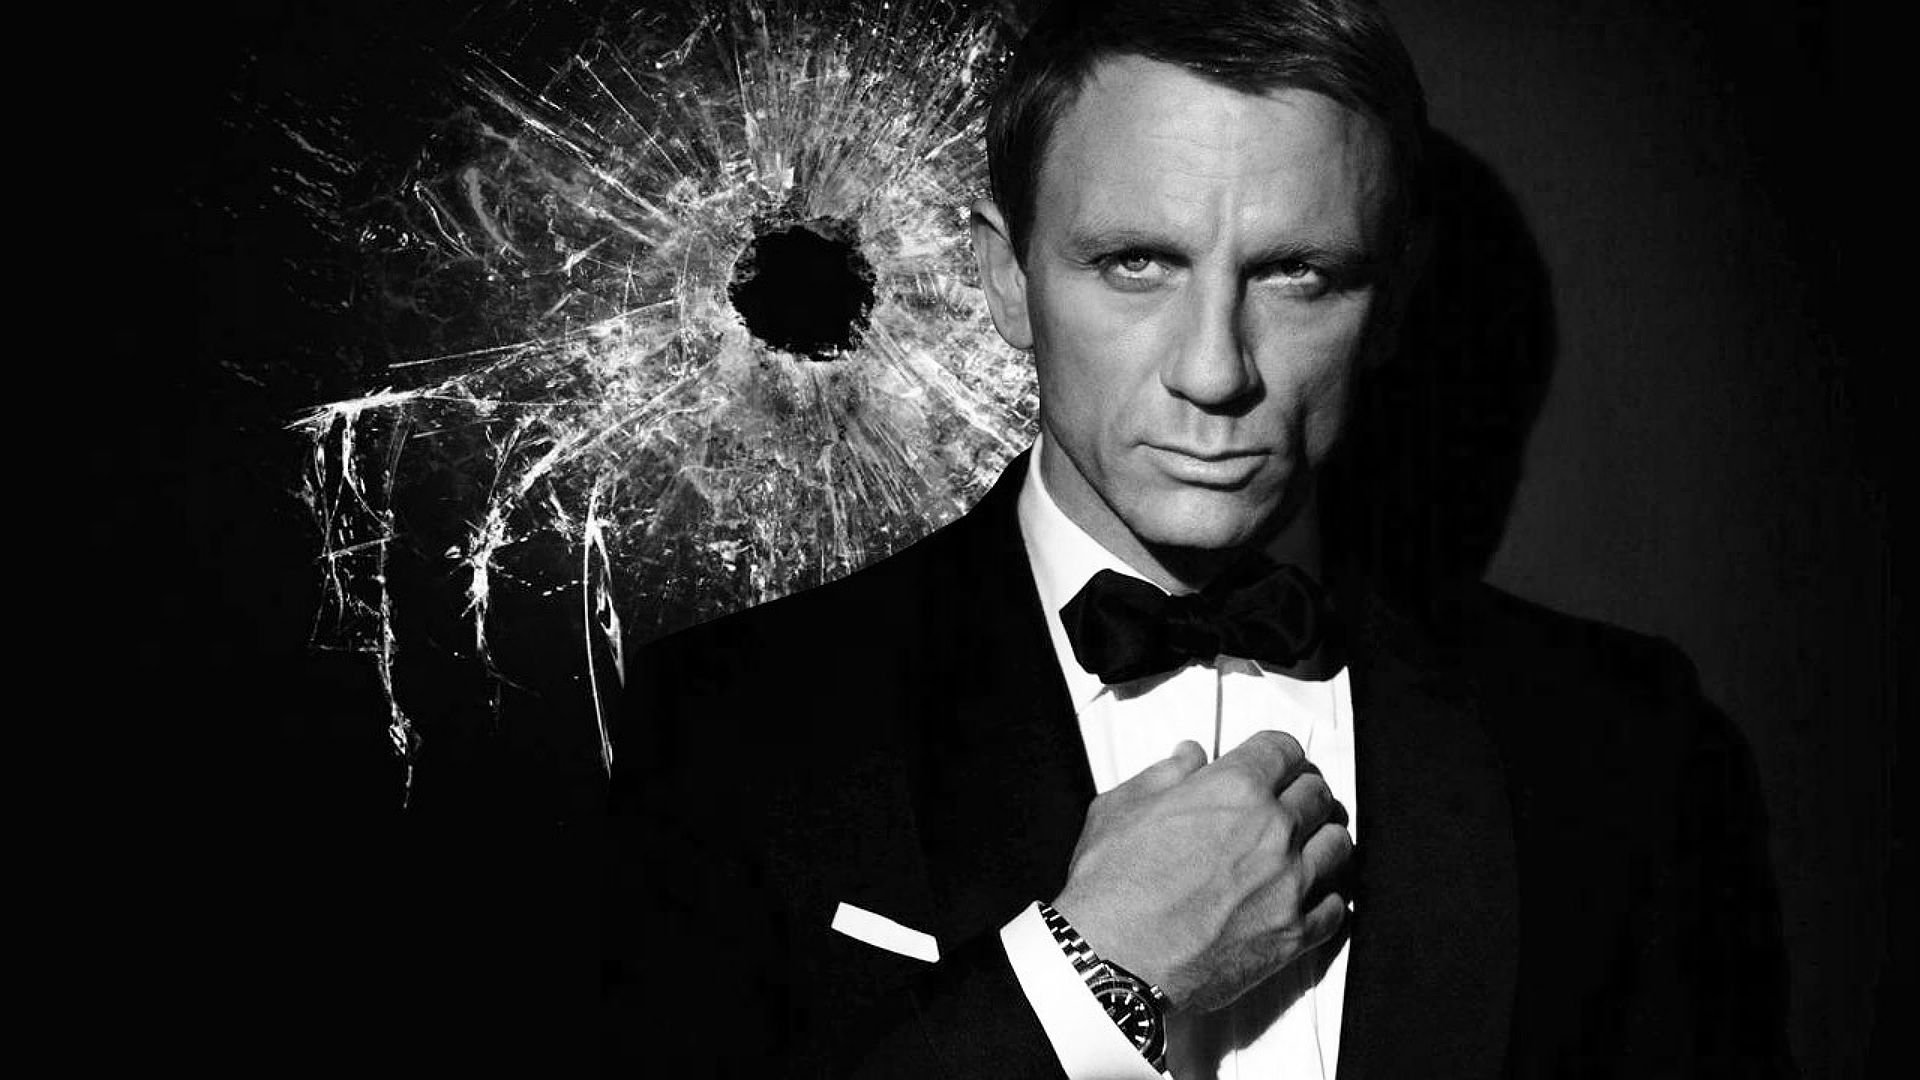 SPECTRE BOND 24 james action spy crime thriller mystery 1spectre 007 1920x1080